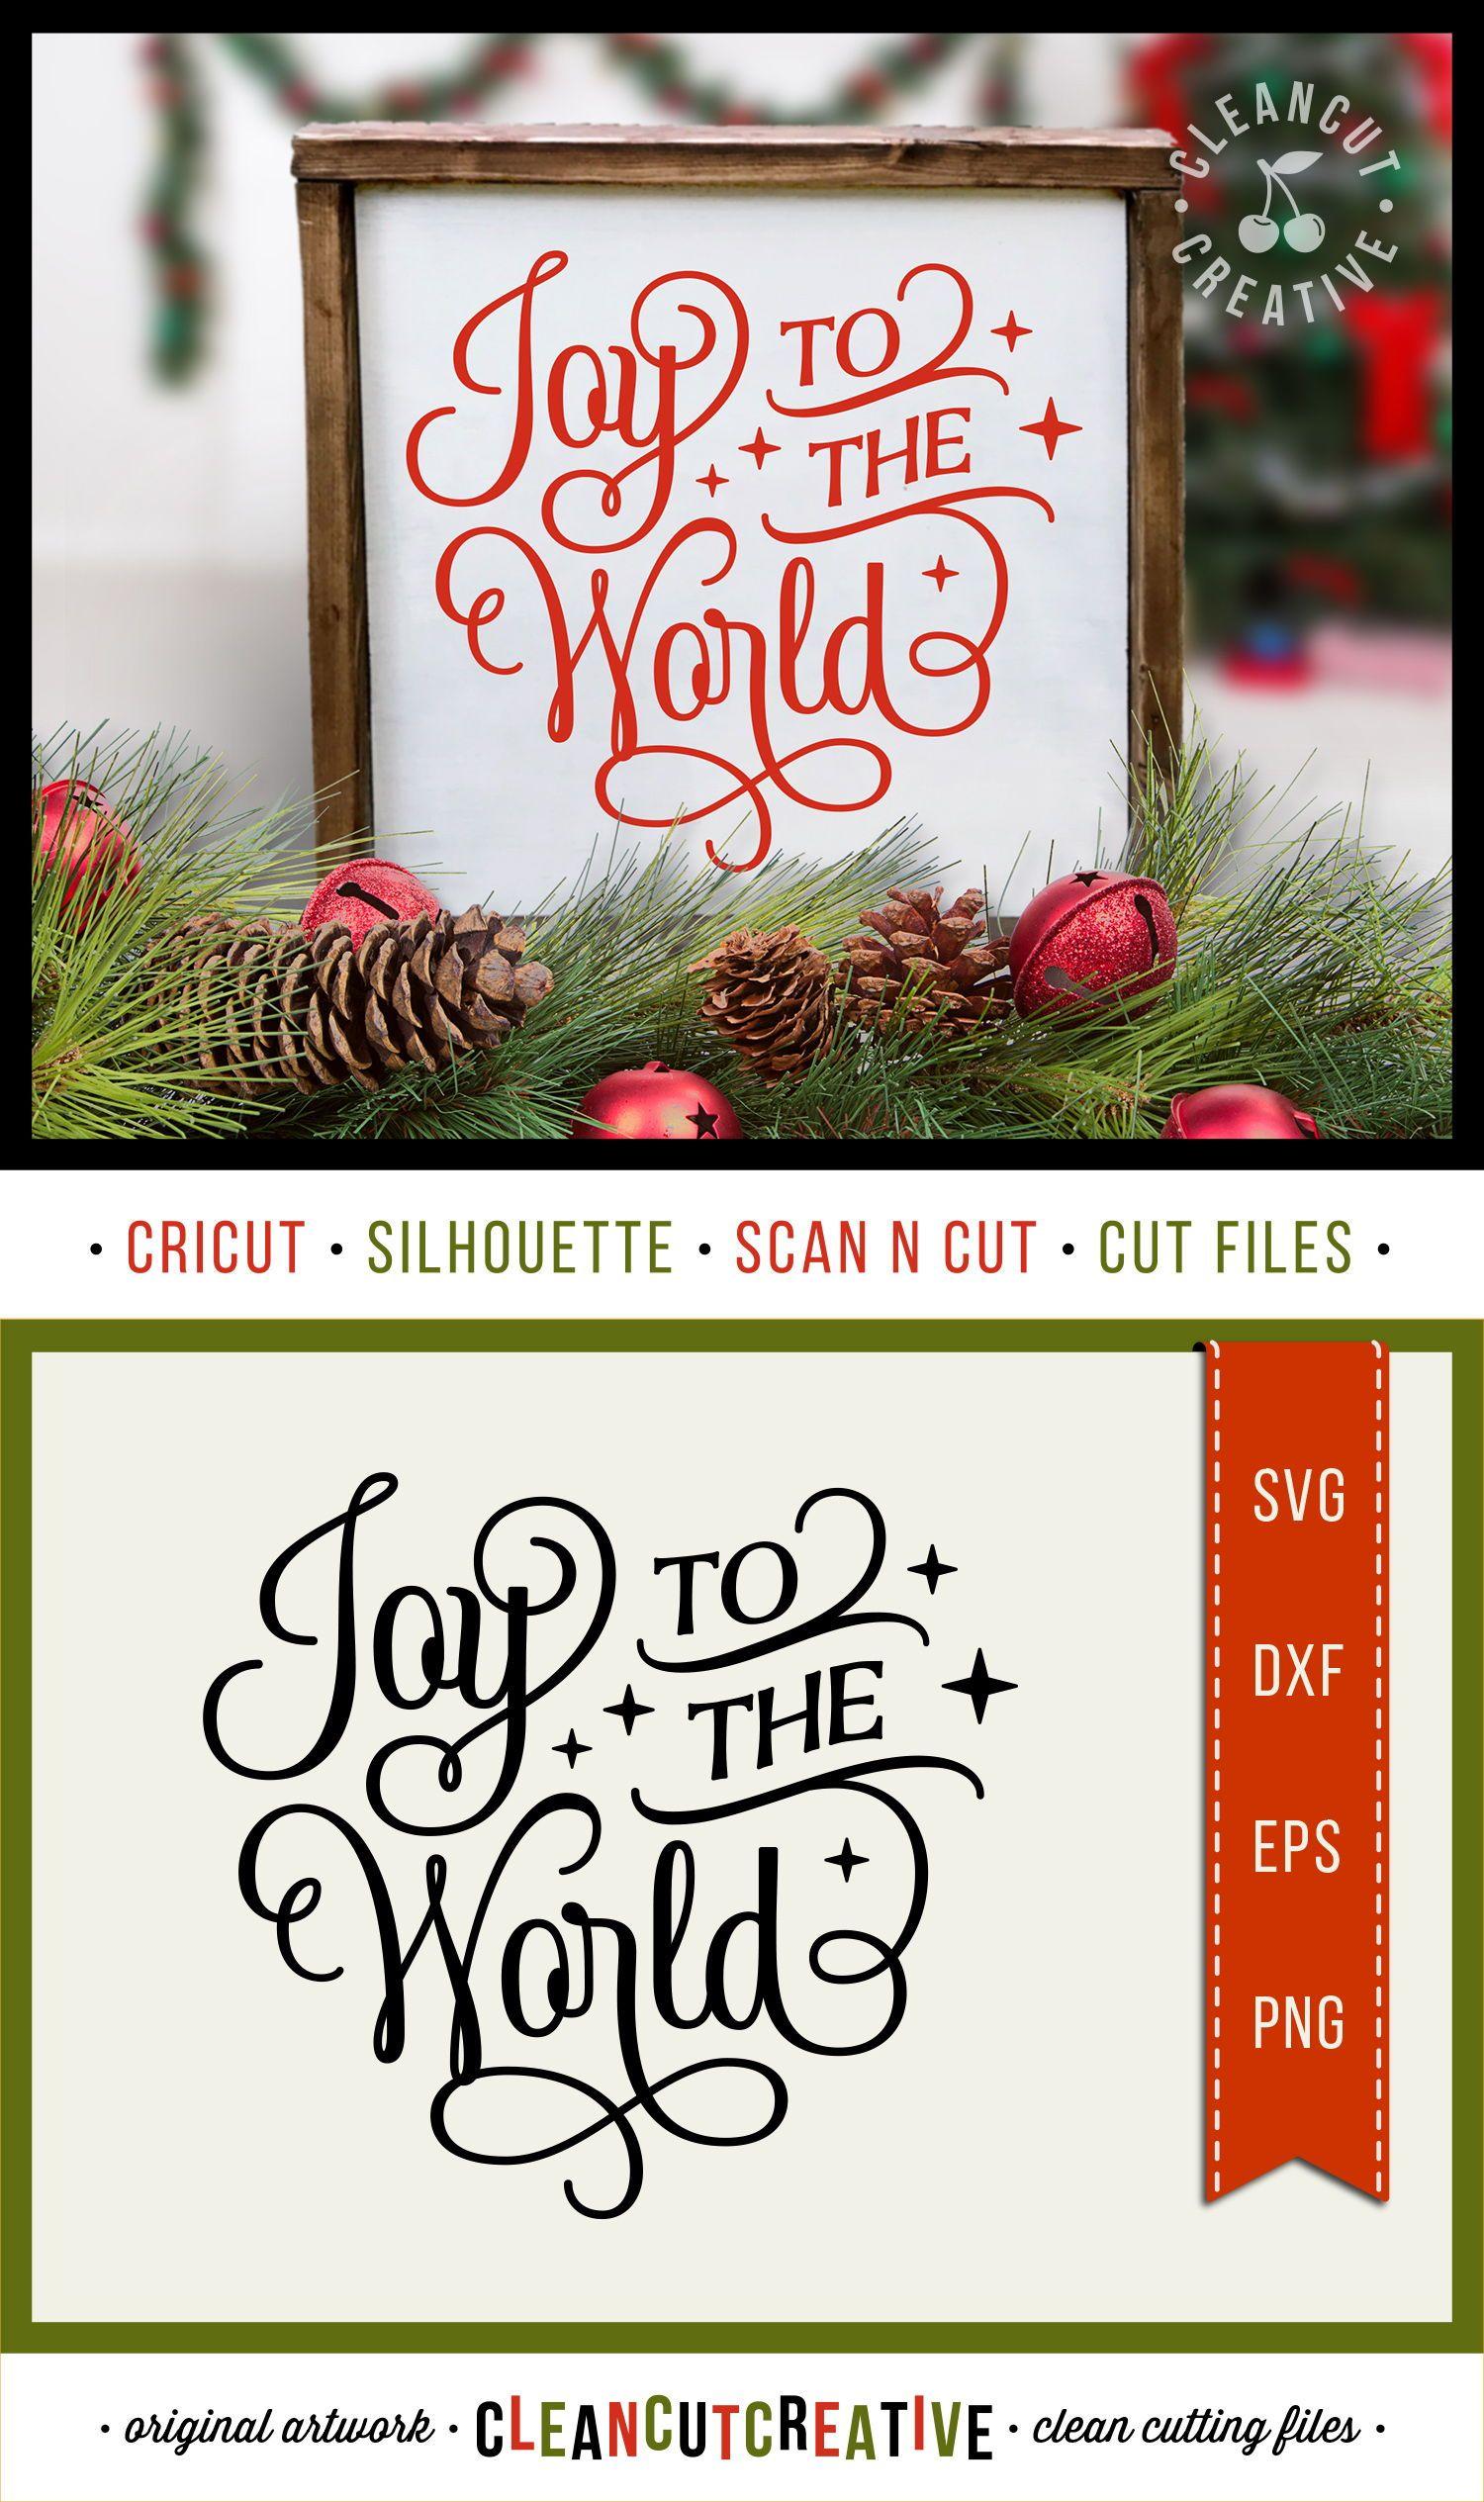 Joy to the World elegant Christmas SVG design for